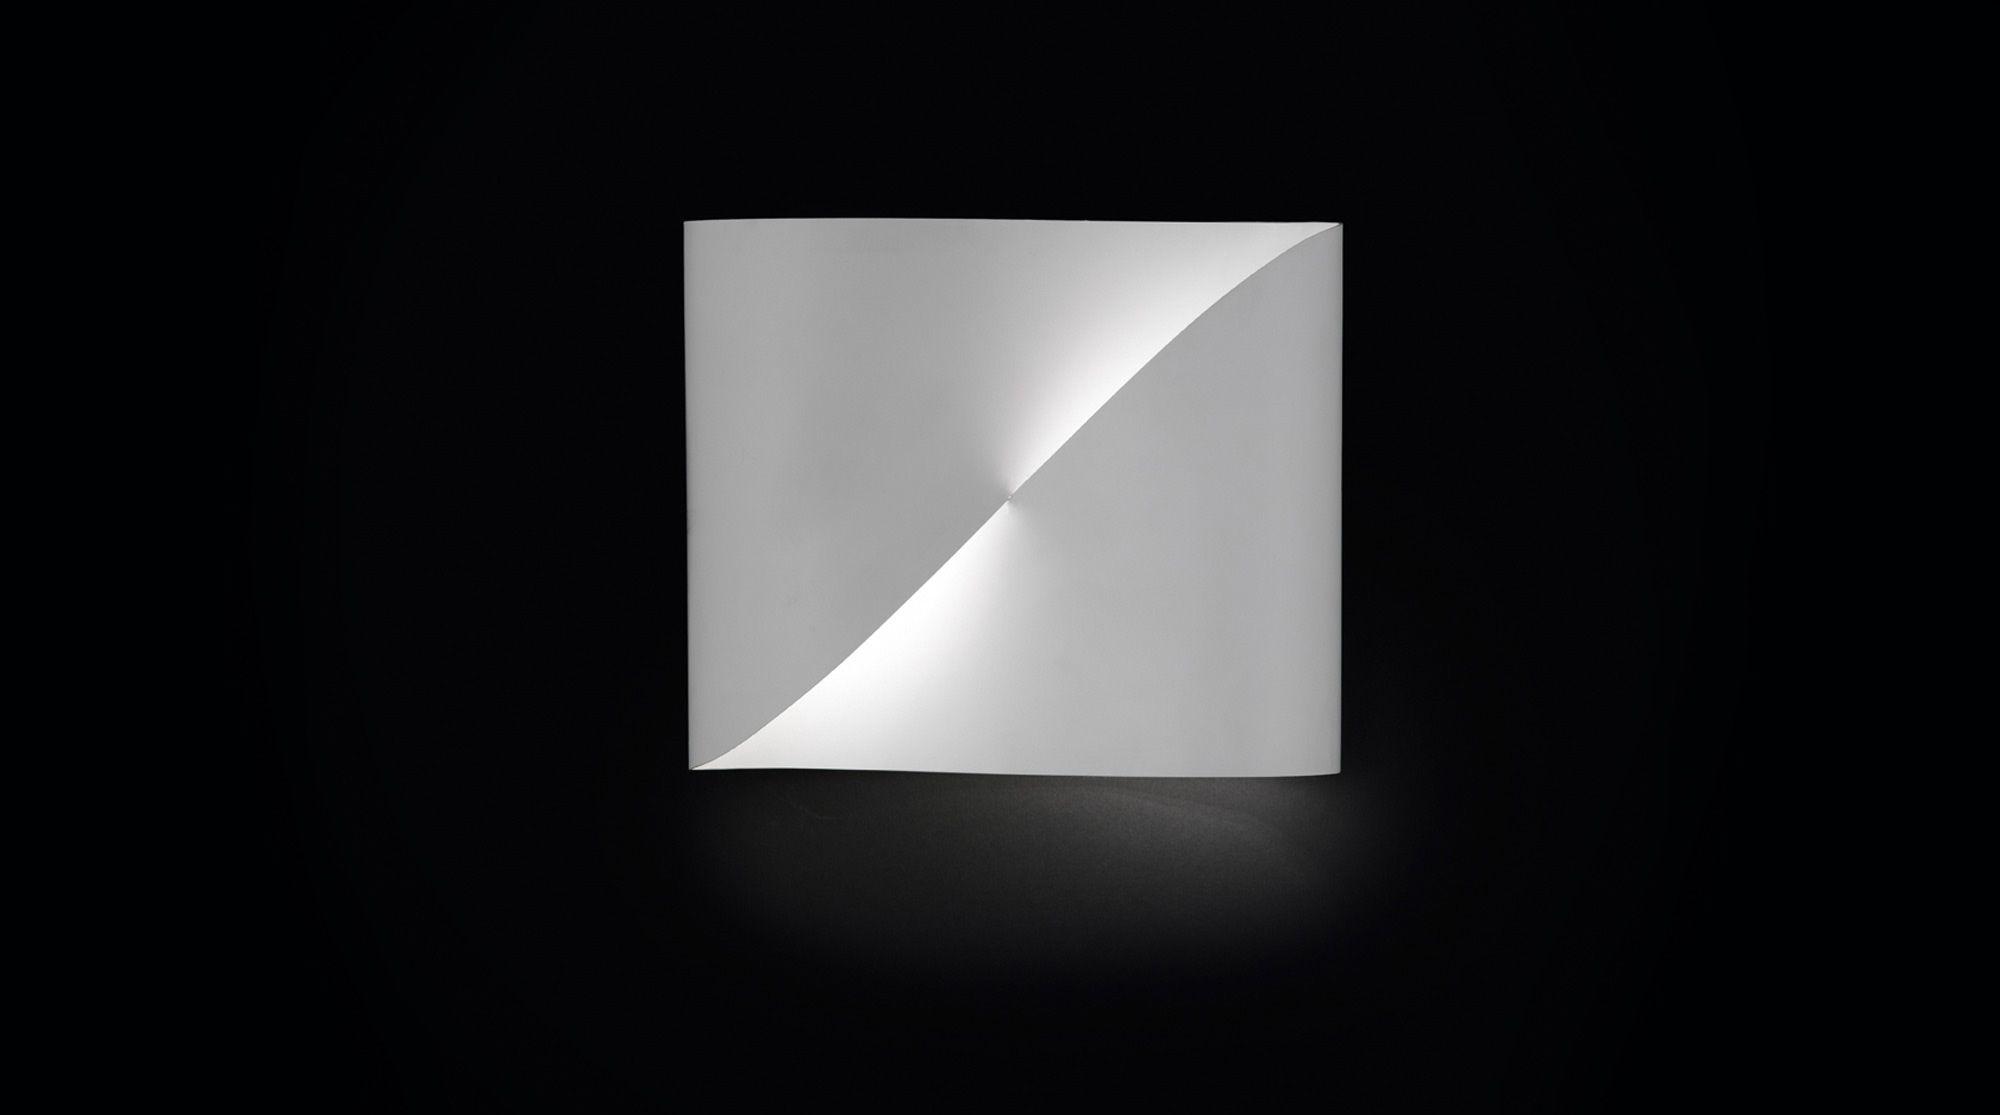 Illuminazione a parete Nemo-Cassina Loop #rifarecasa #maistatocosifacile grazie a #designbox & #designcard #idfsrl